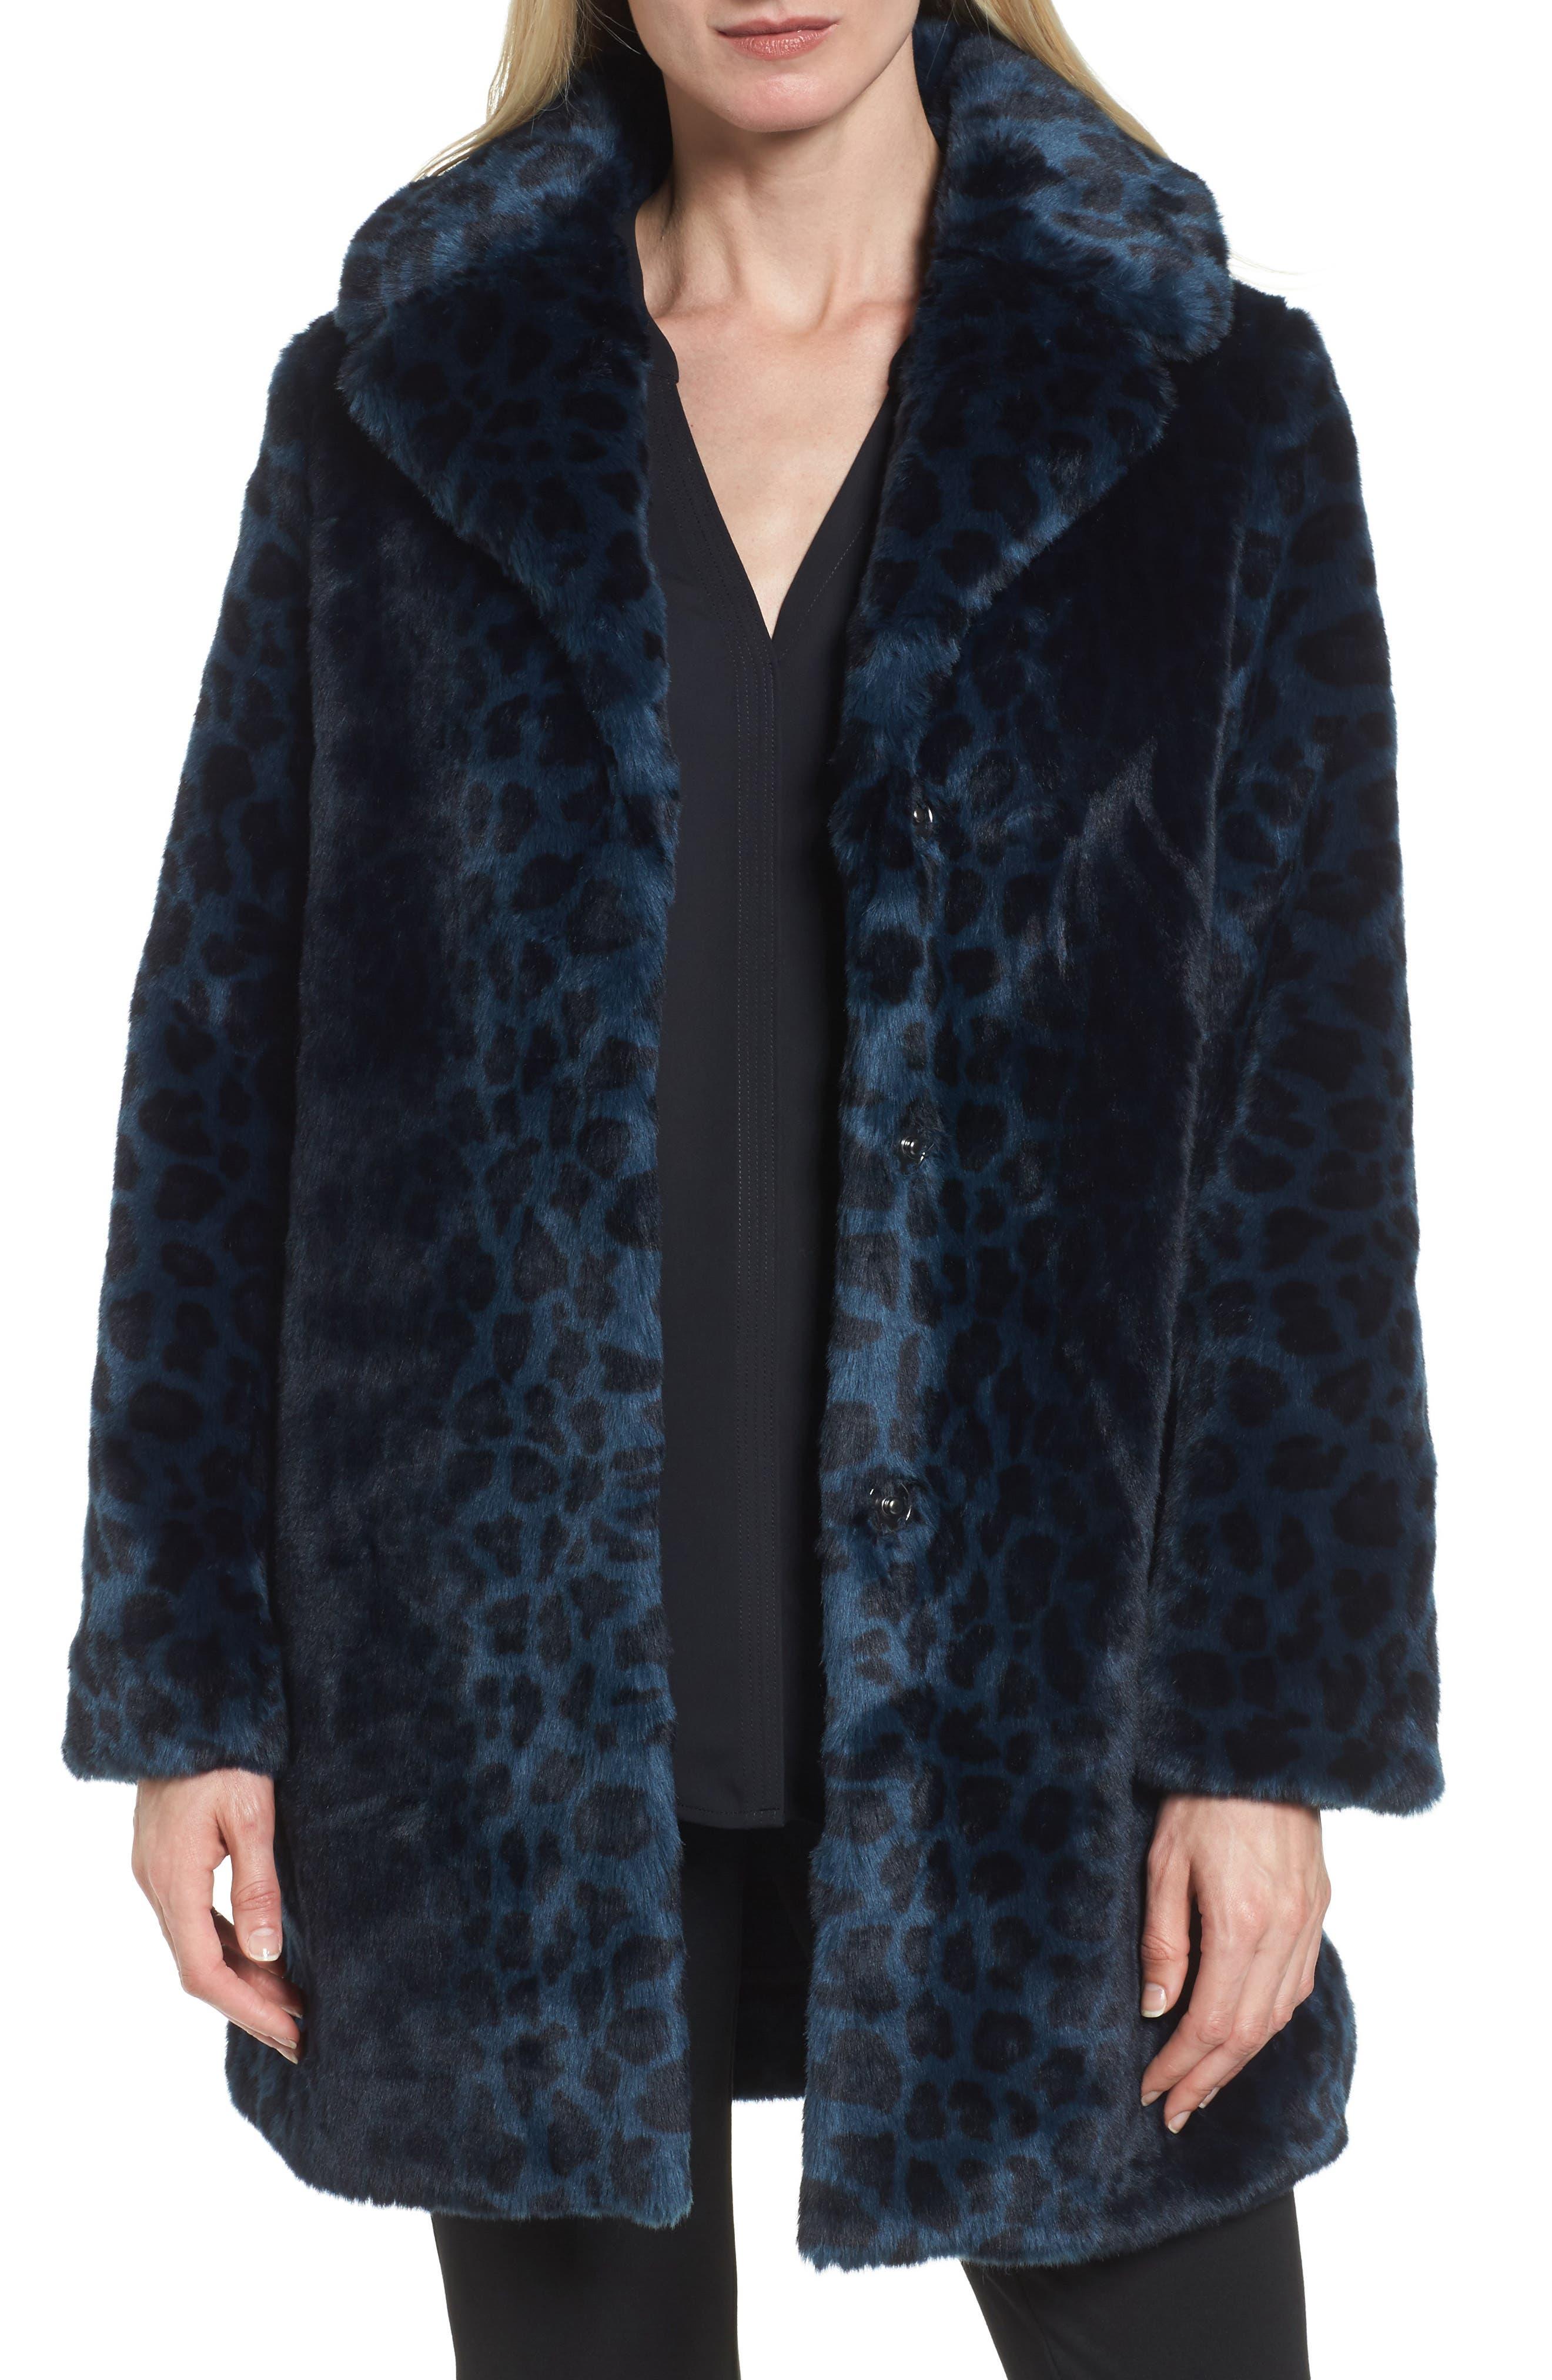 Laundry by Shelli Segal Reversible Cheetah Print Faux Fur Jacket